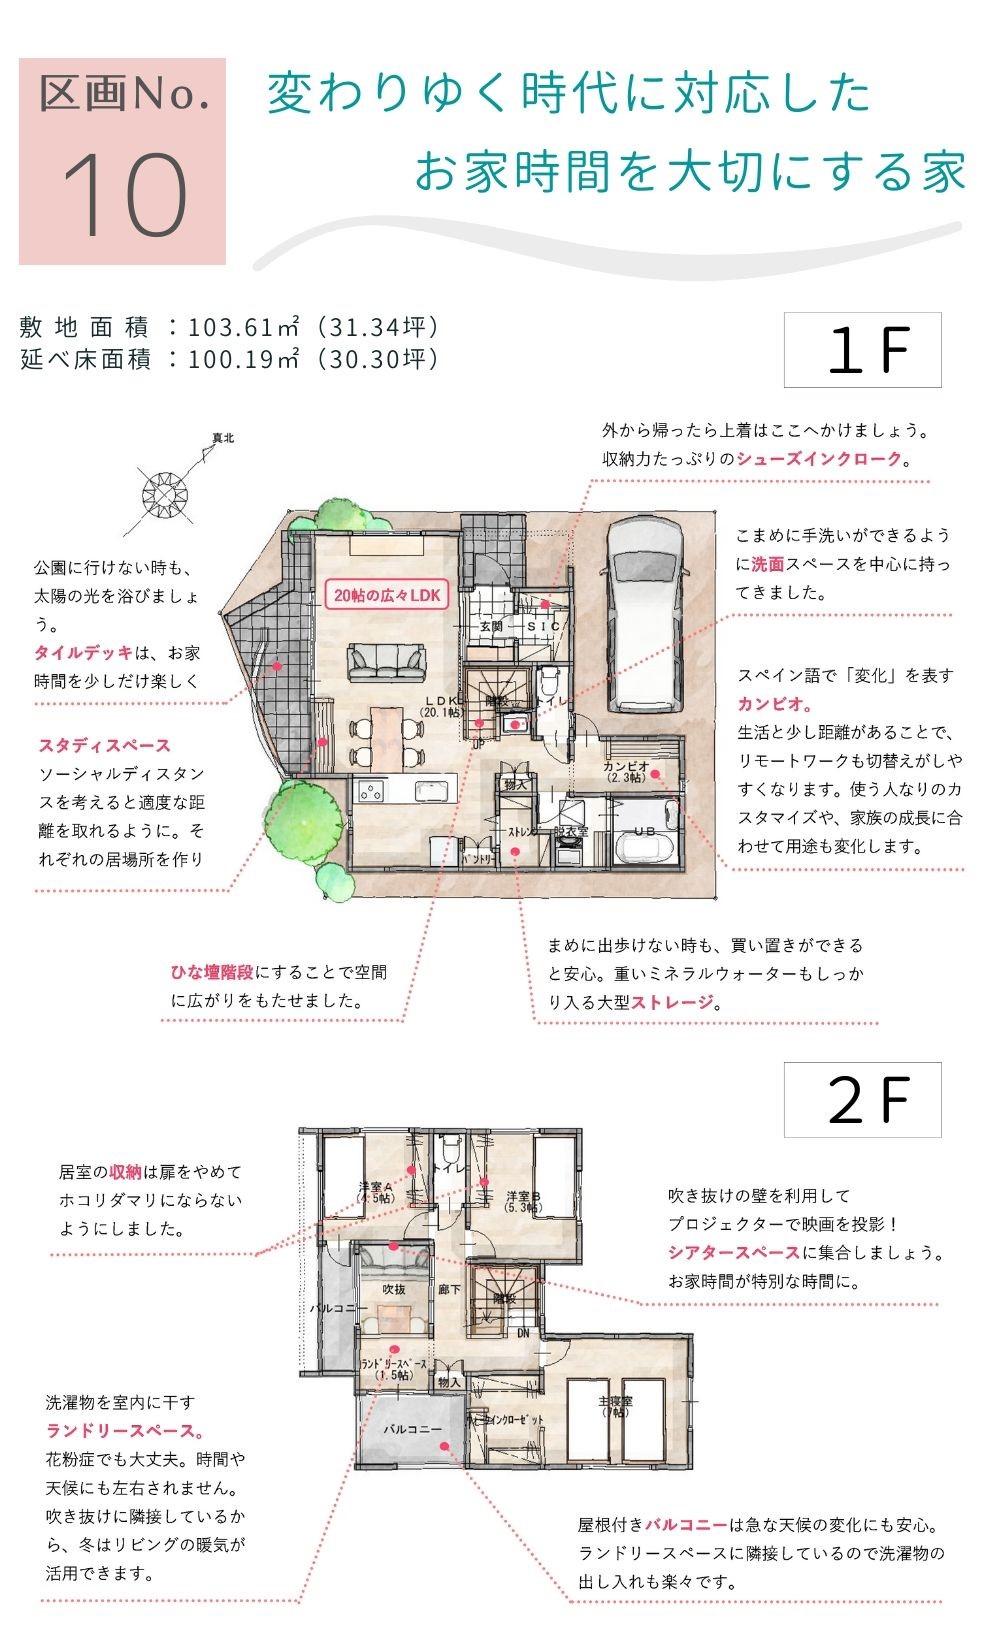 VISIO飯山満Ⅵ│参考プラン